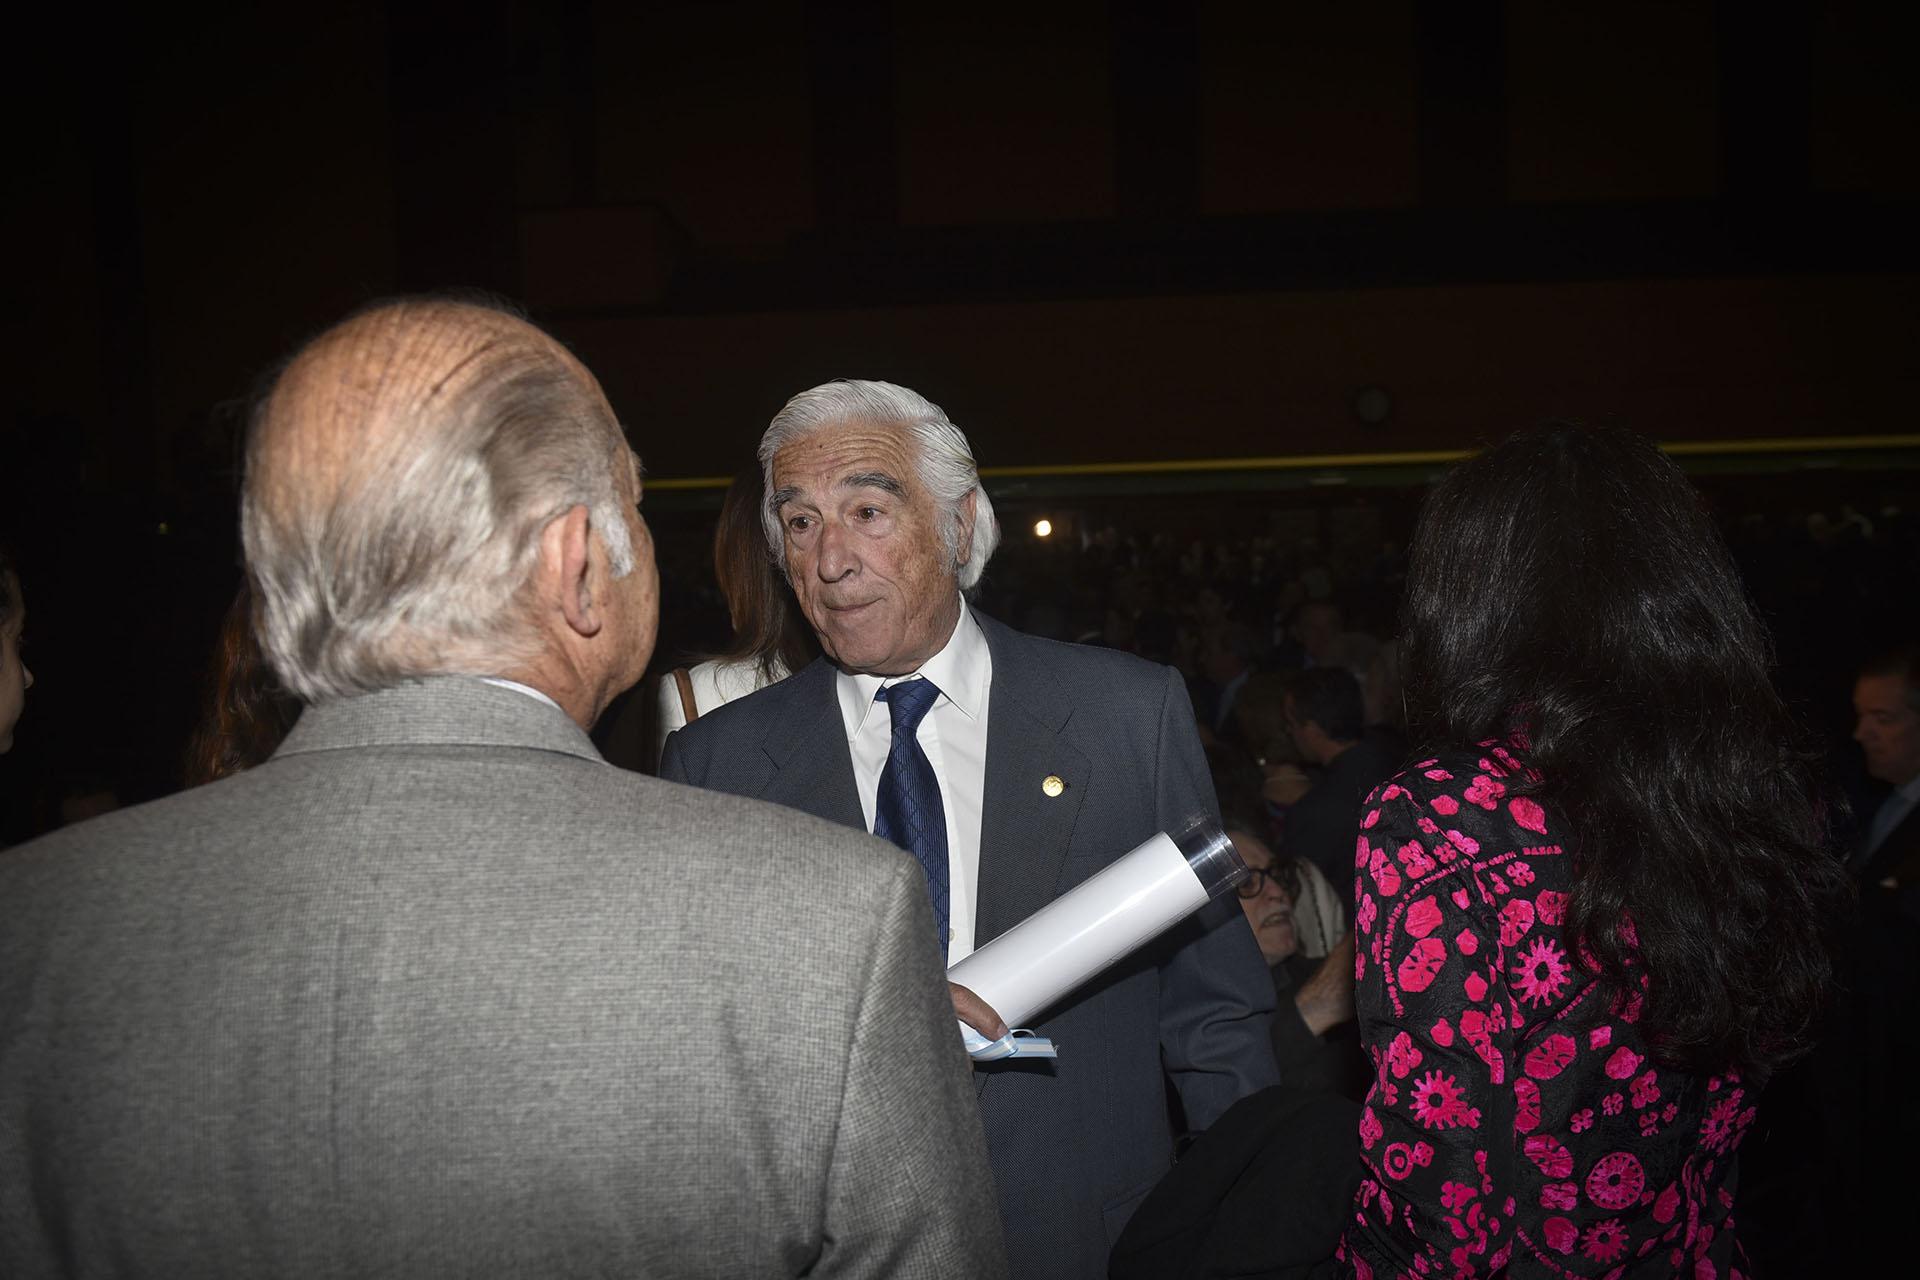 Luciano Miguens